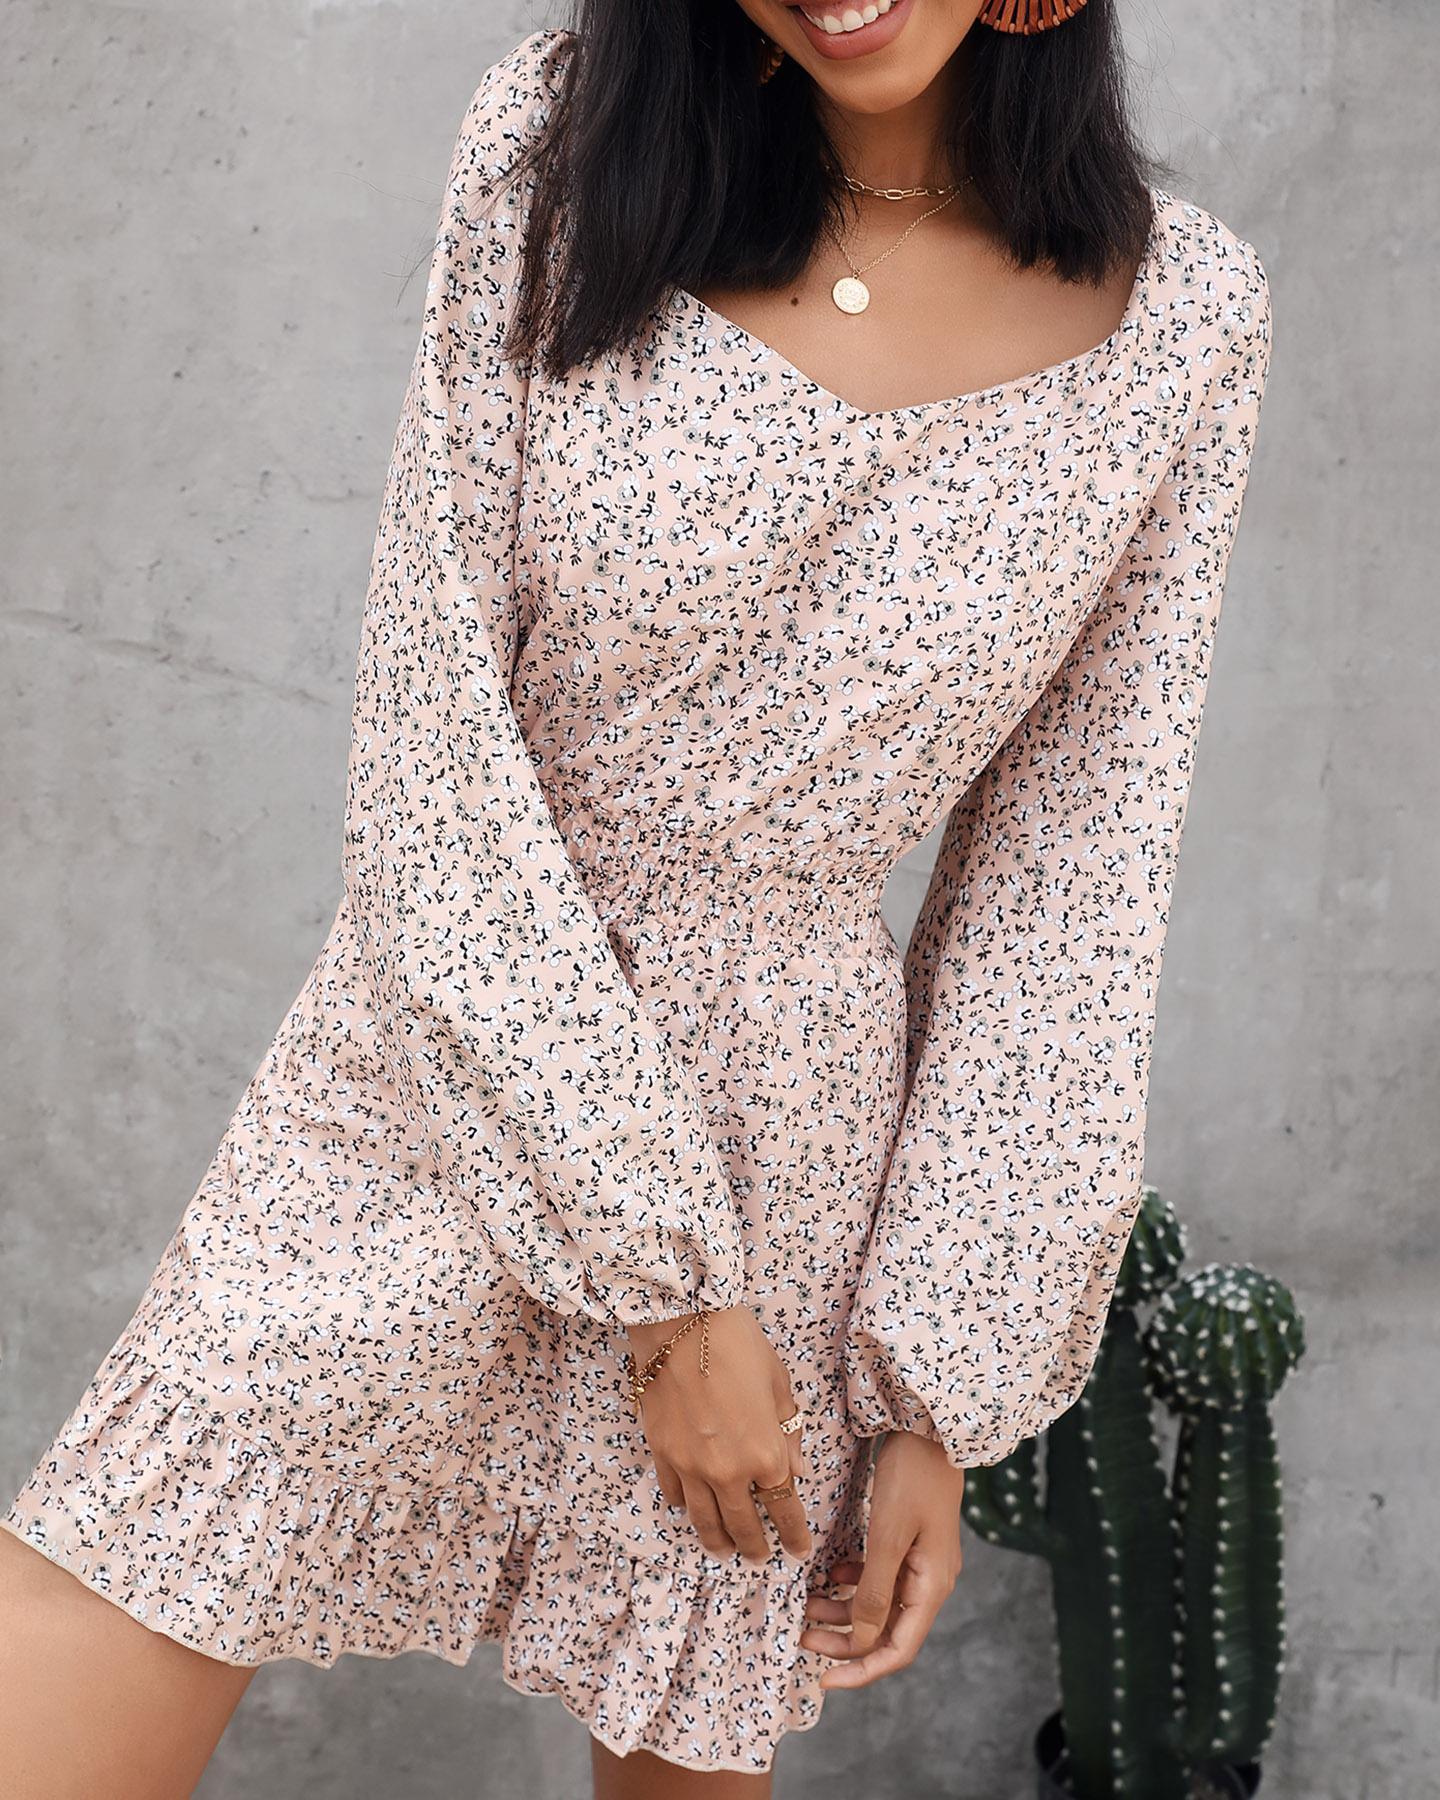 Ditsy Floral Print Bloomer Sleeve Ruffles Skinny Waist Dress, Khaki